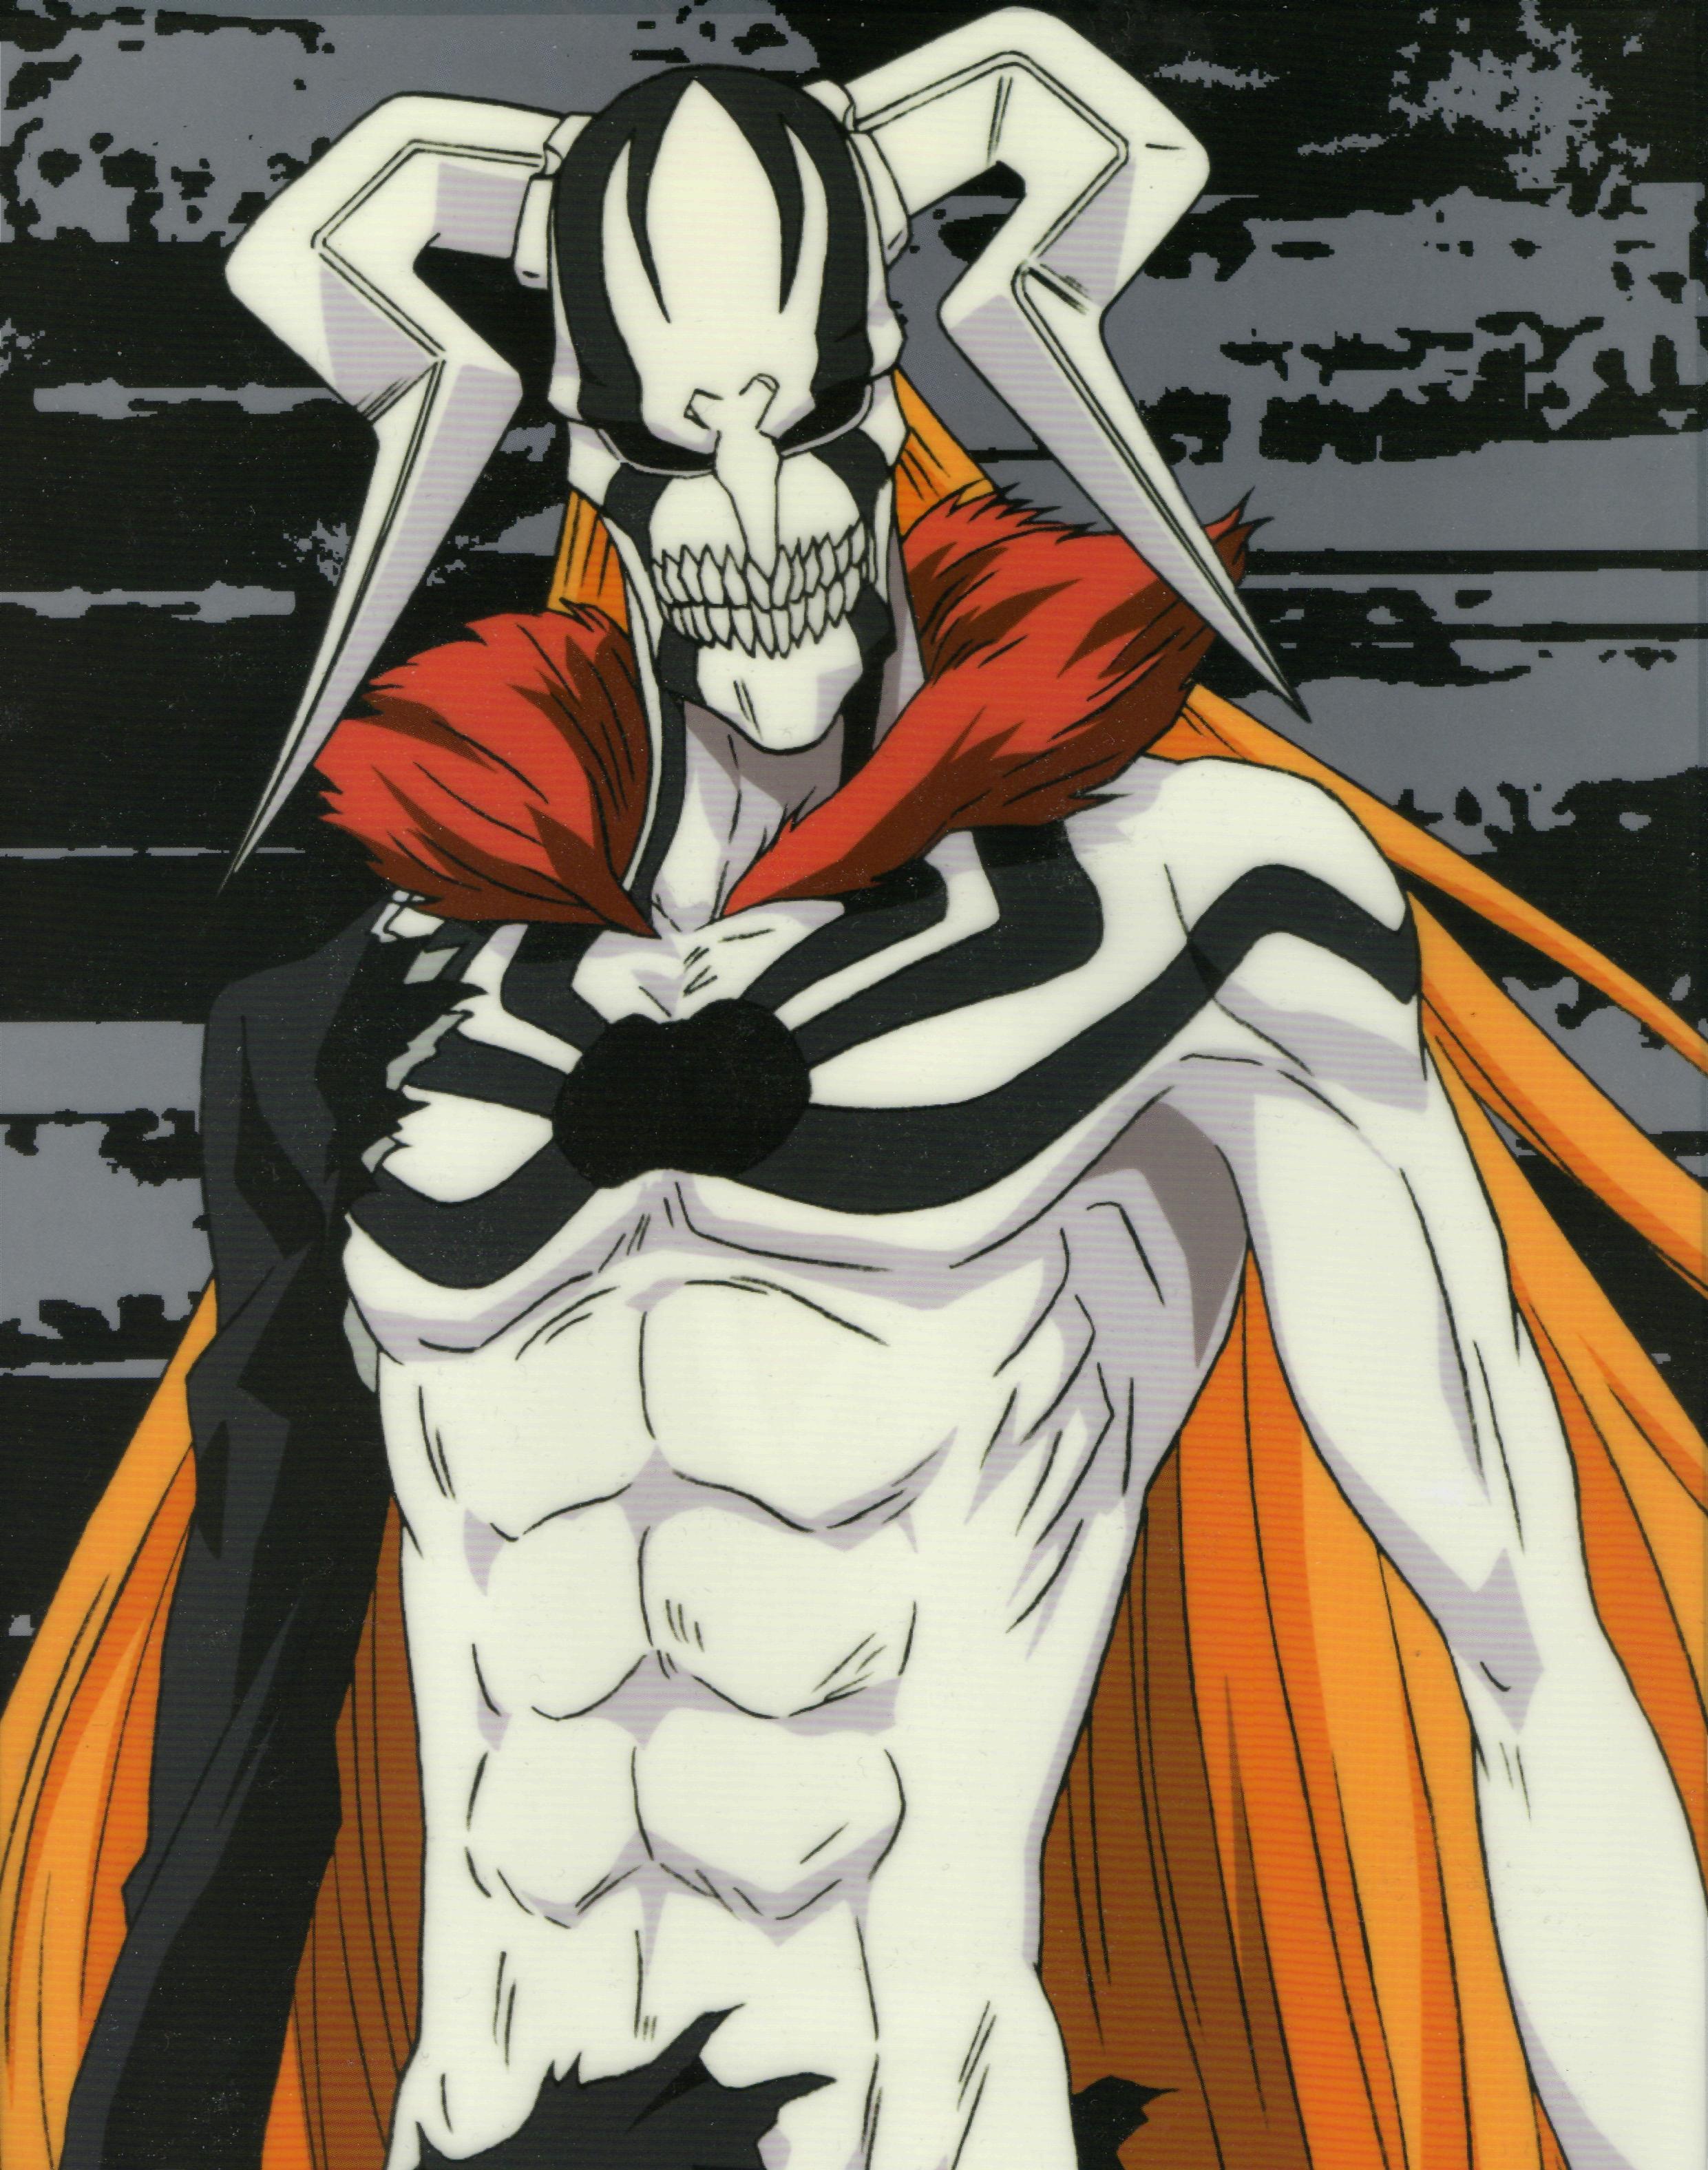 Full Hollow Hollow Ichigo Full